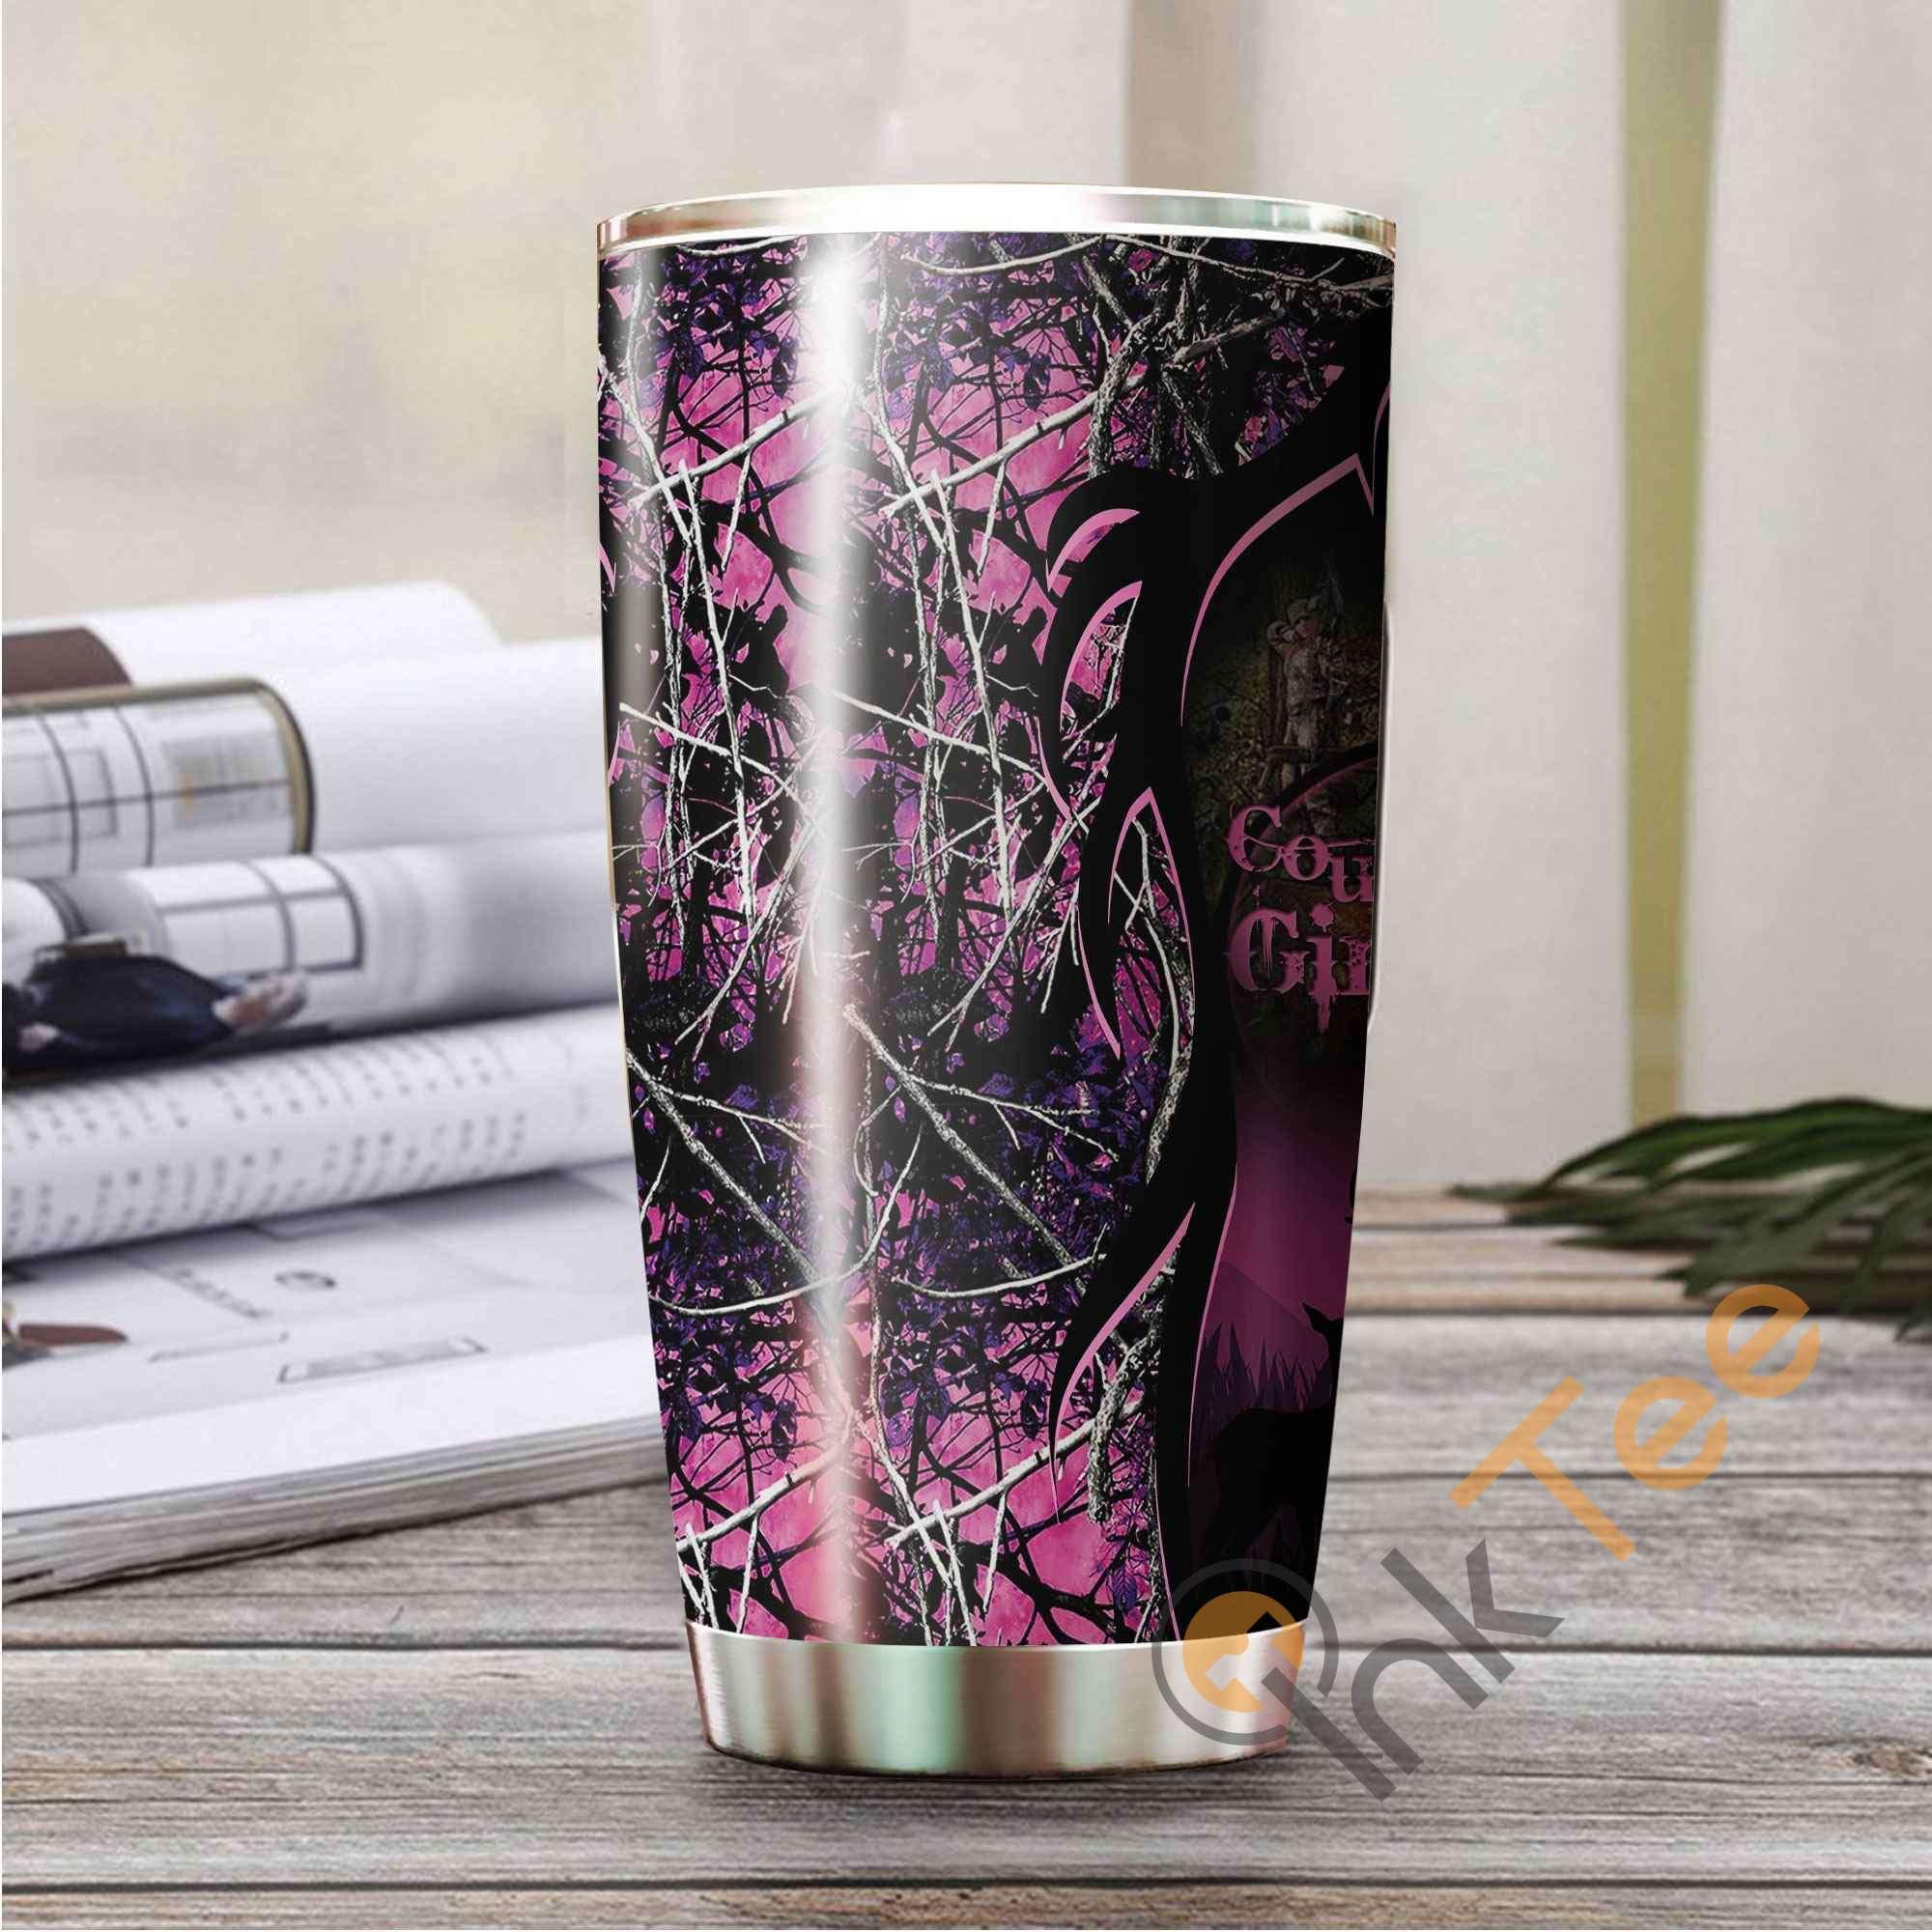 Country Girl Amazon Best Seller Sku 2720 Stainless Steel Tumbler